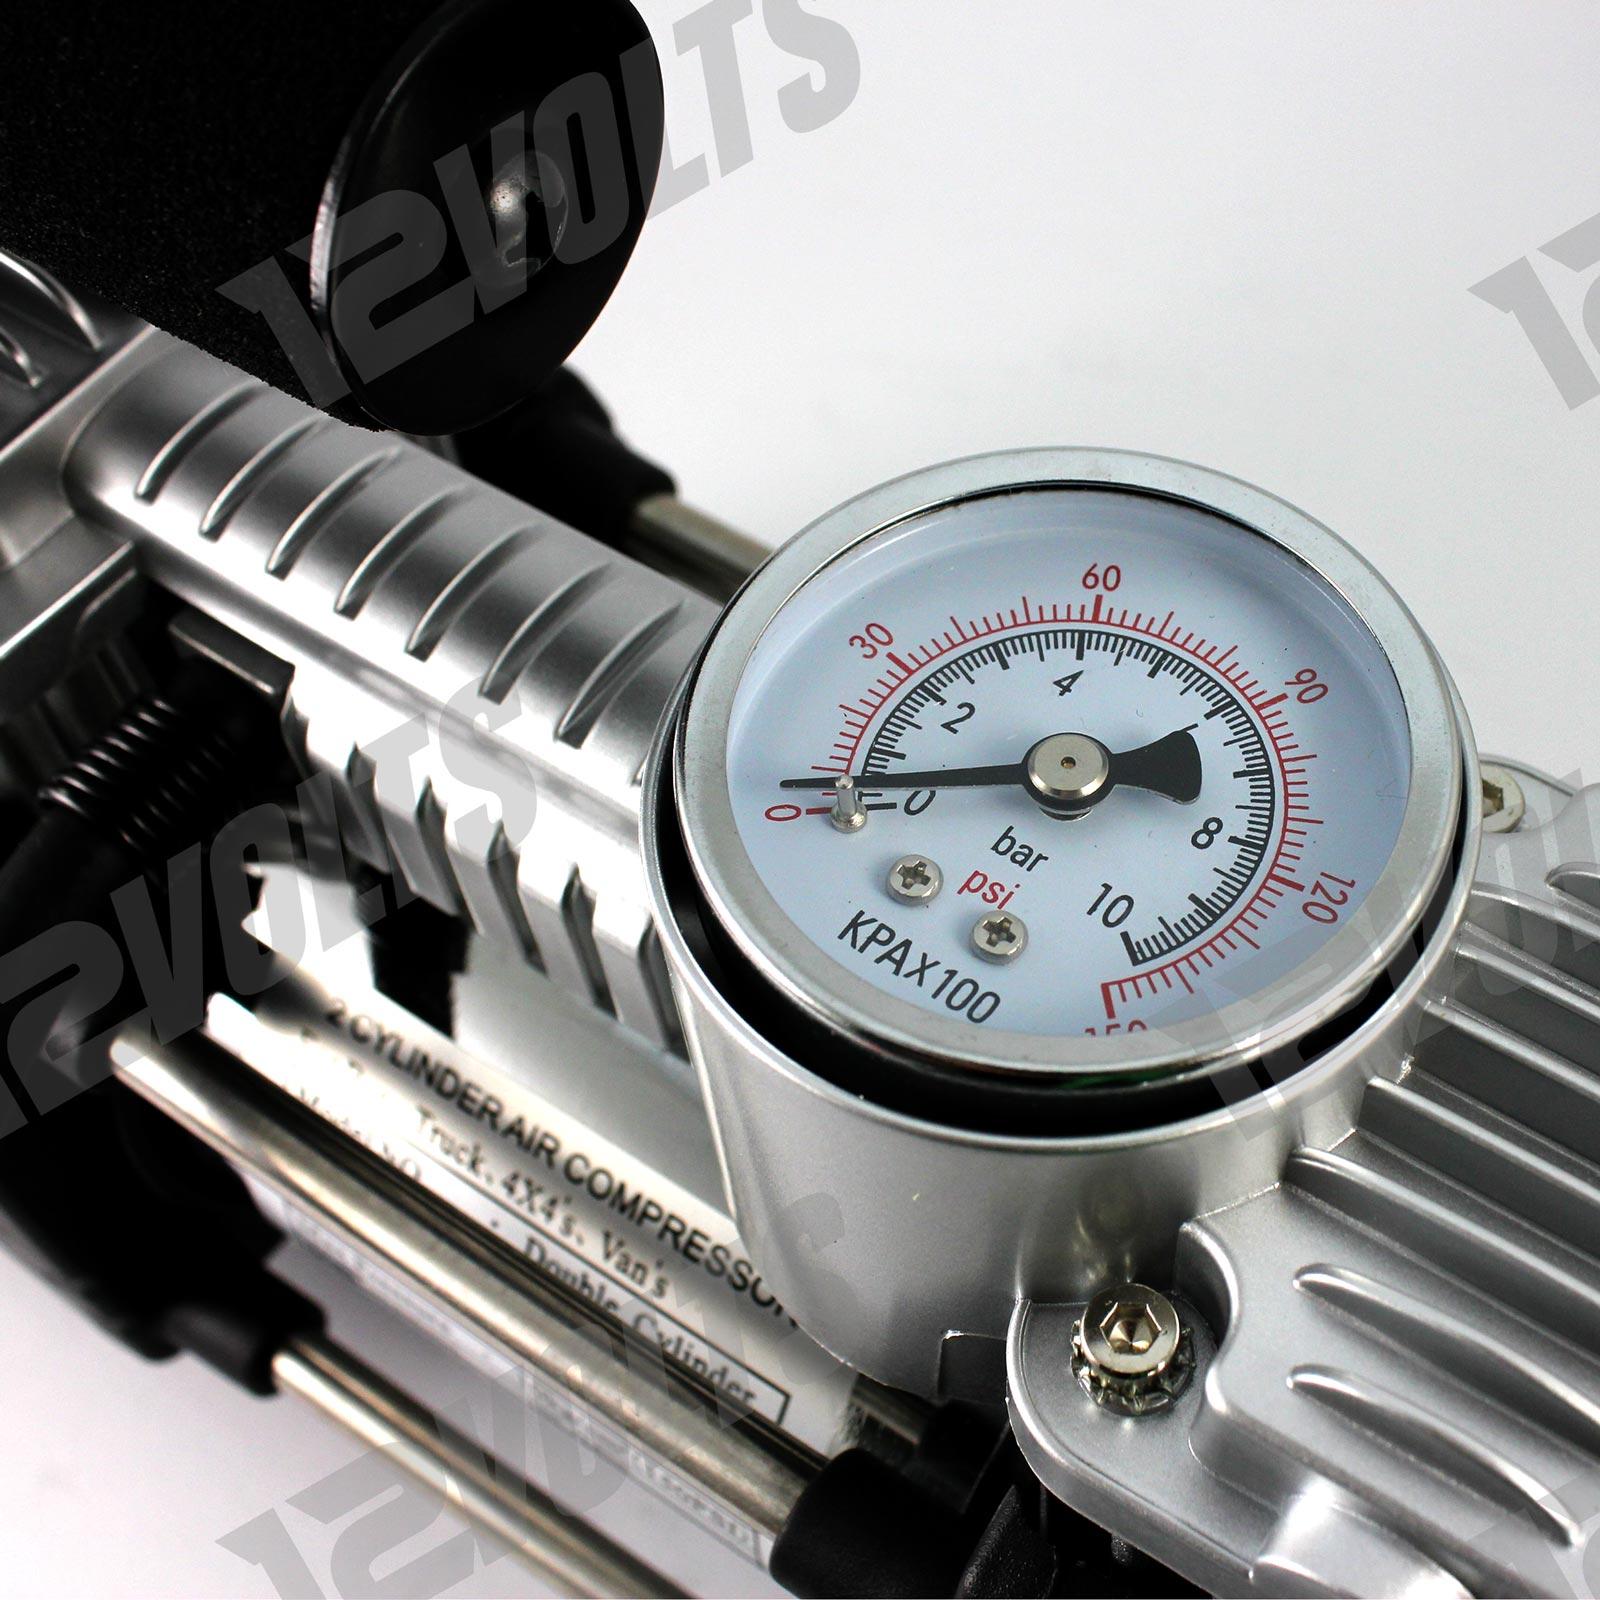 12V 150 PSI Portable 2 Cylinder Car Tire Inflator Compressor Air Pump